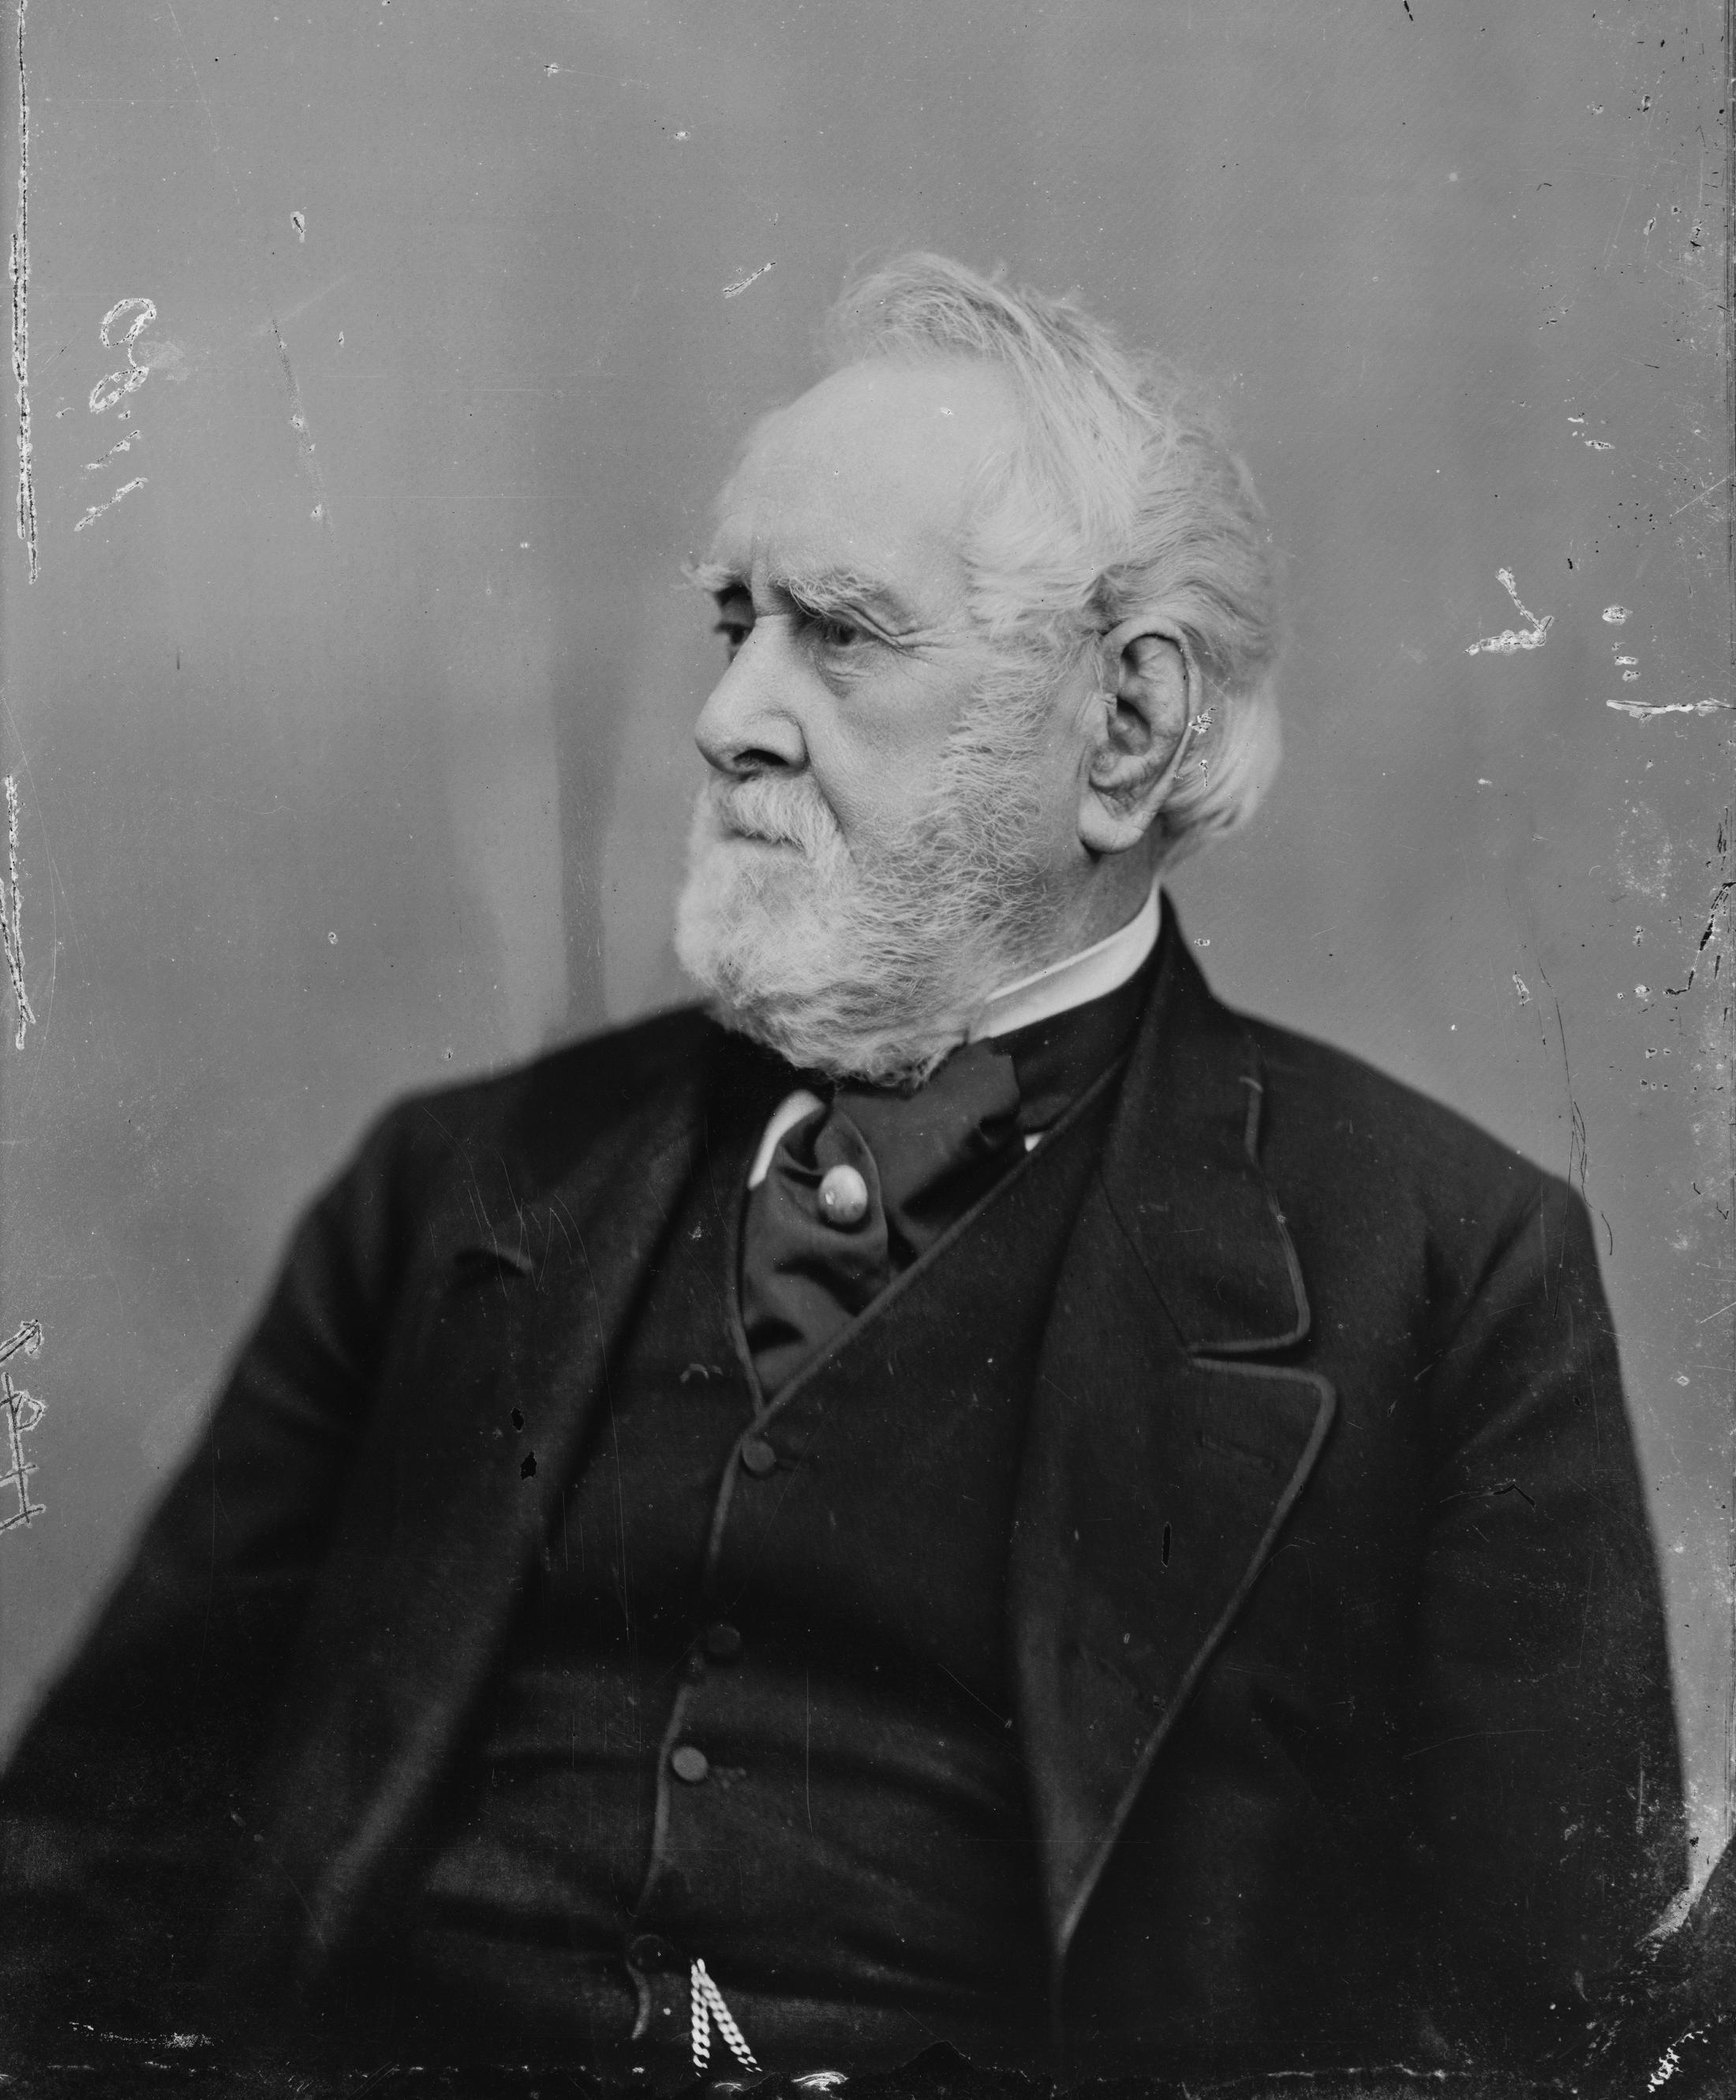 A black and white portrait of William Corcoran.